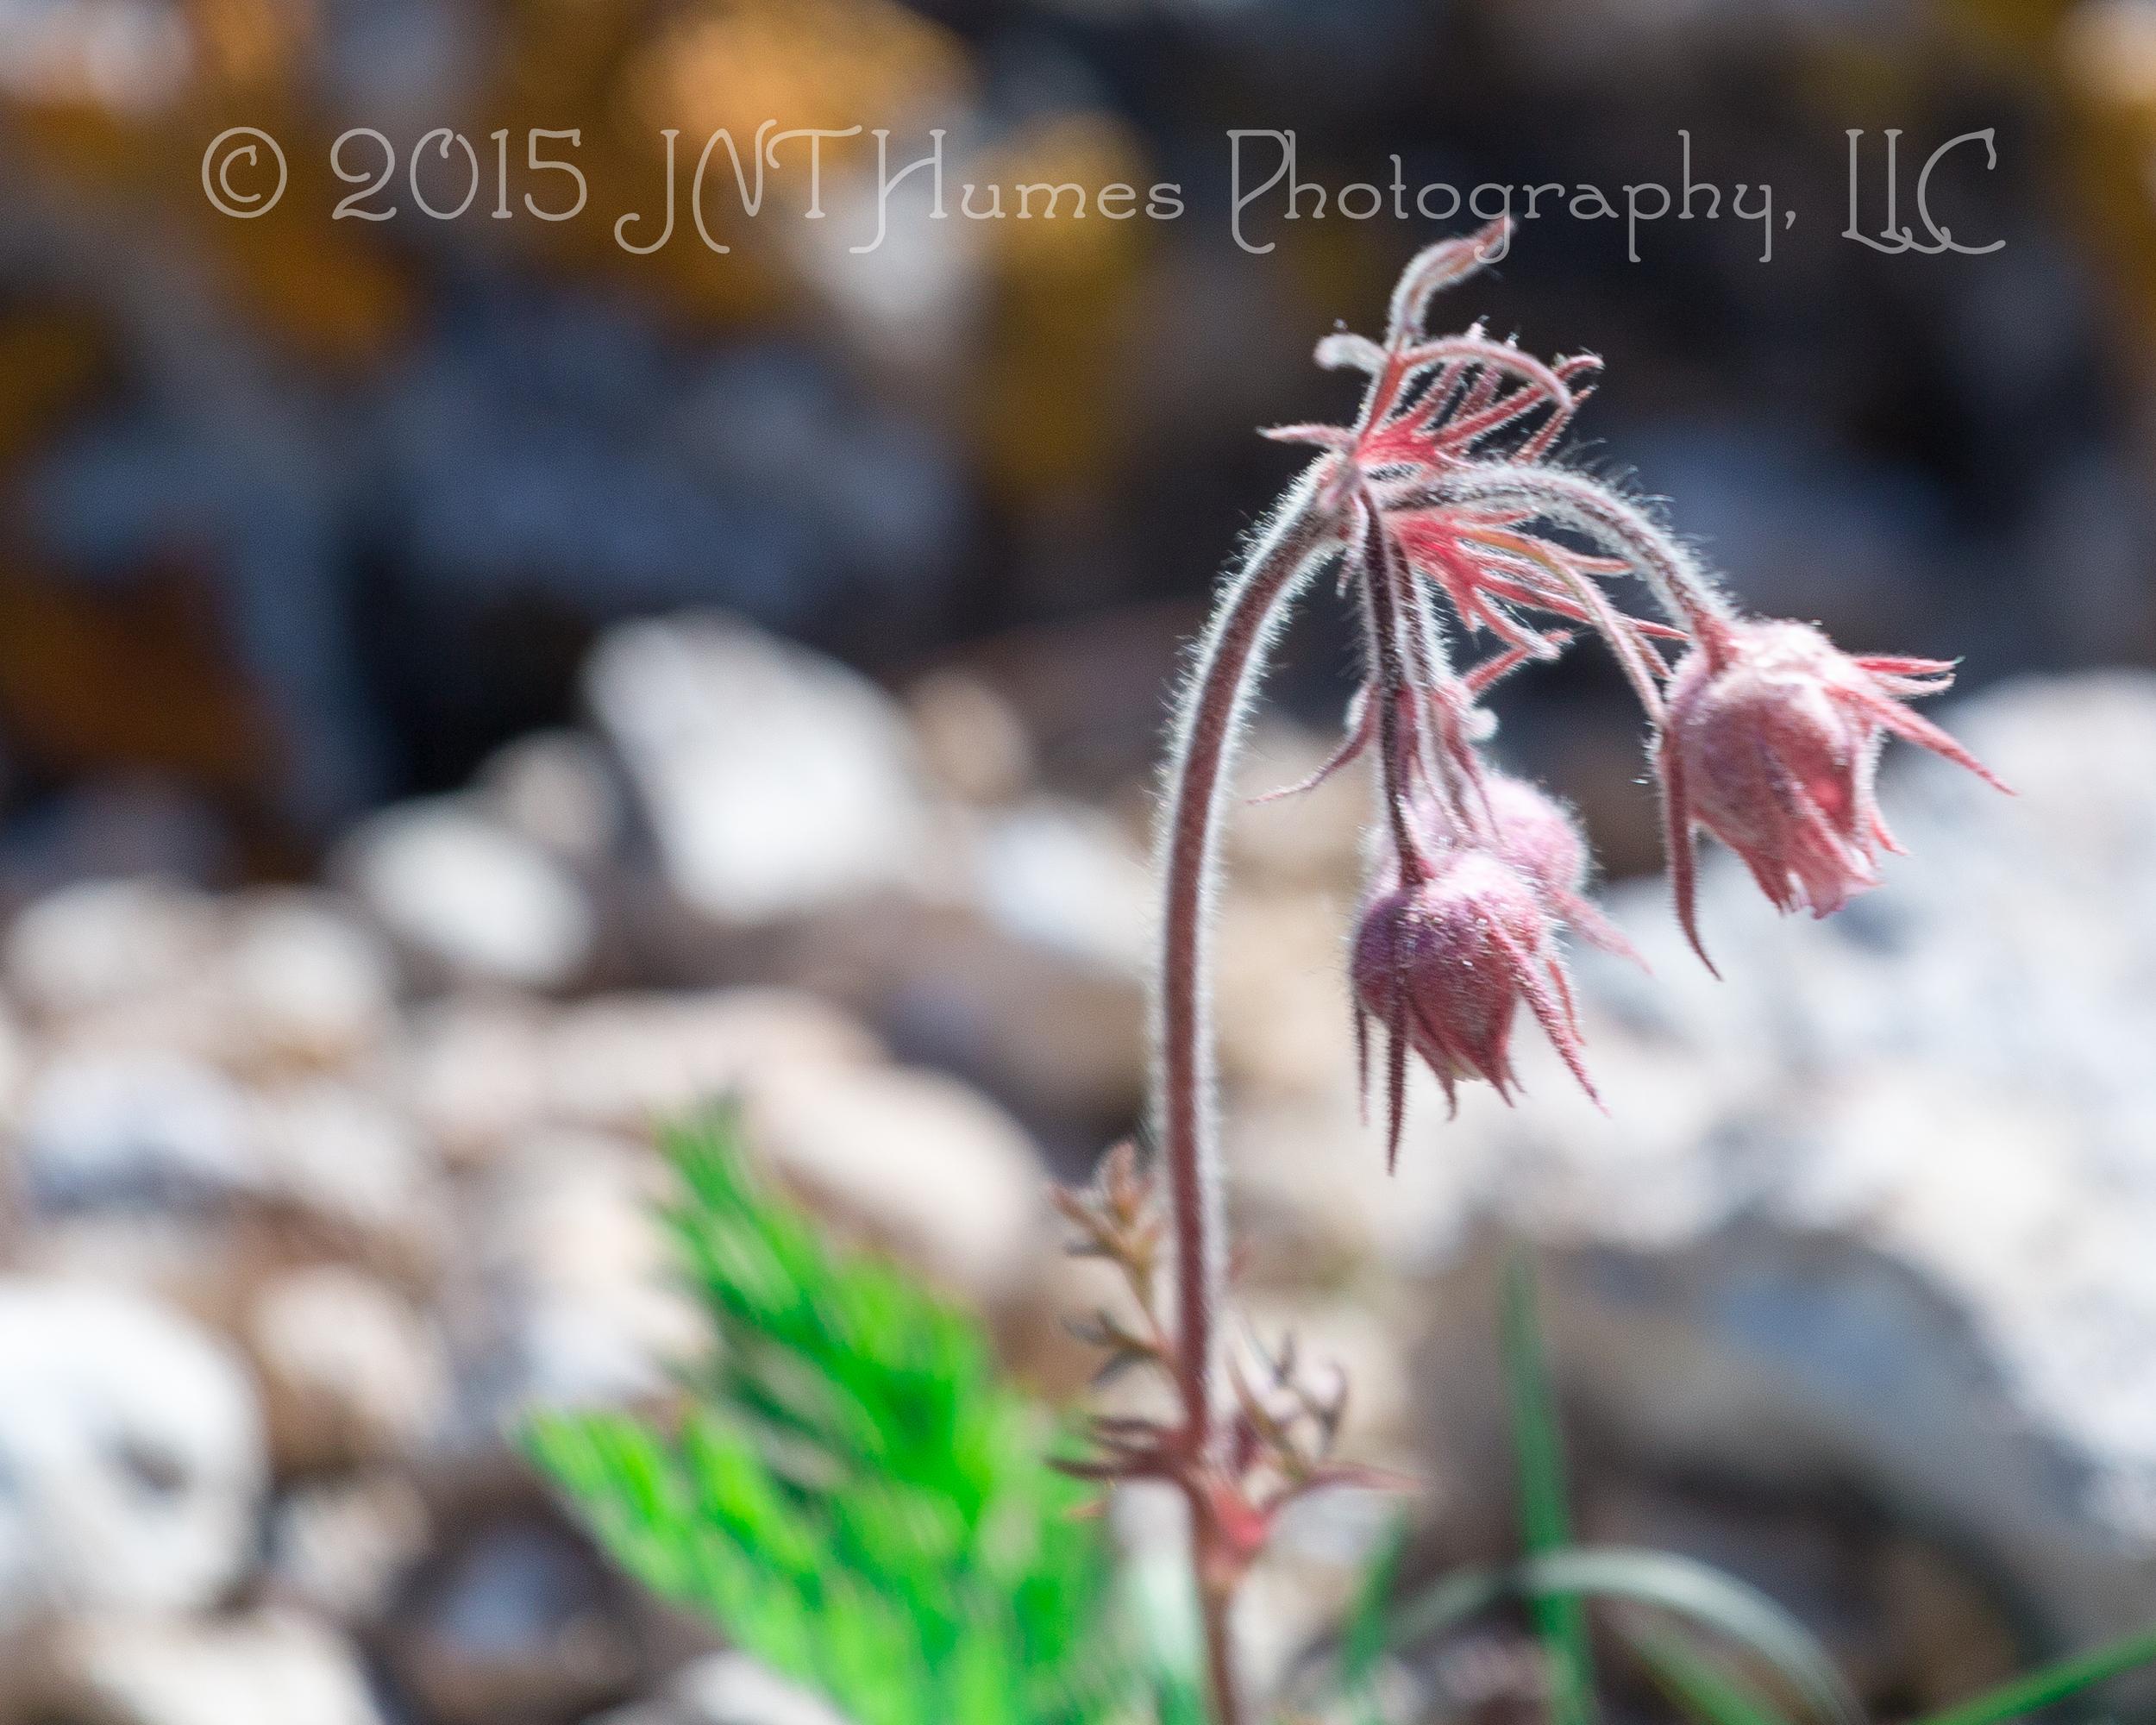 20160604-IMG_2084© 2016 JNT Humes Photography, LLC.jpg